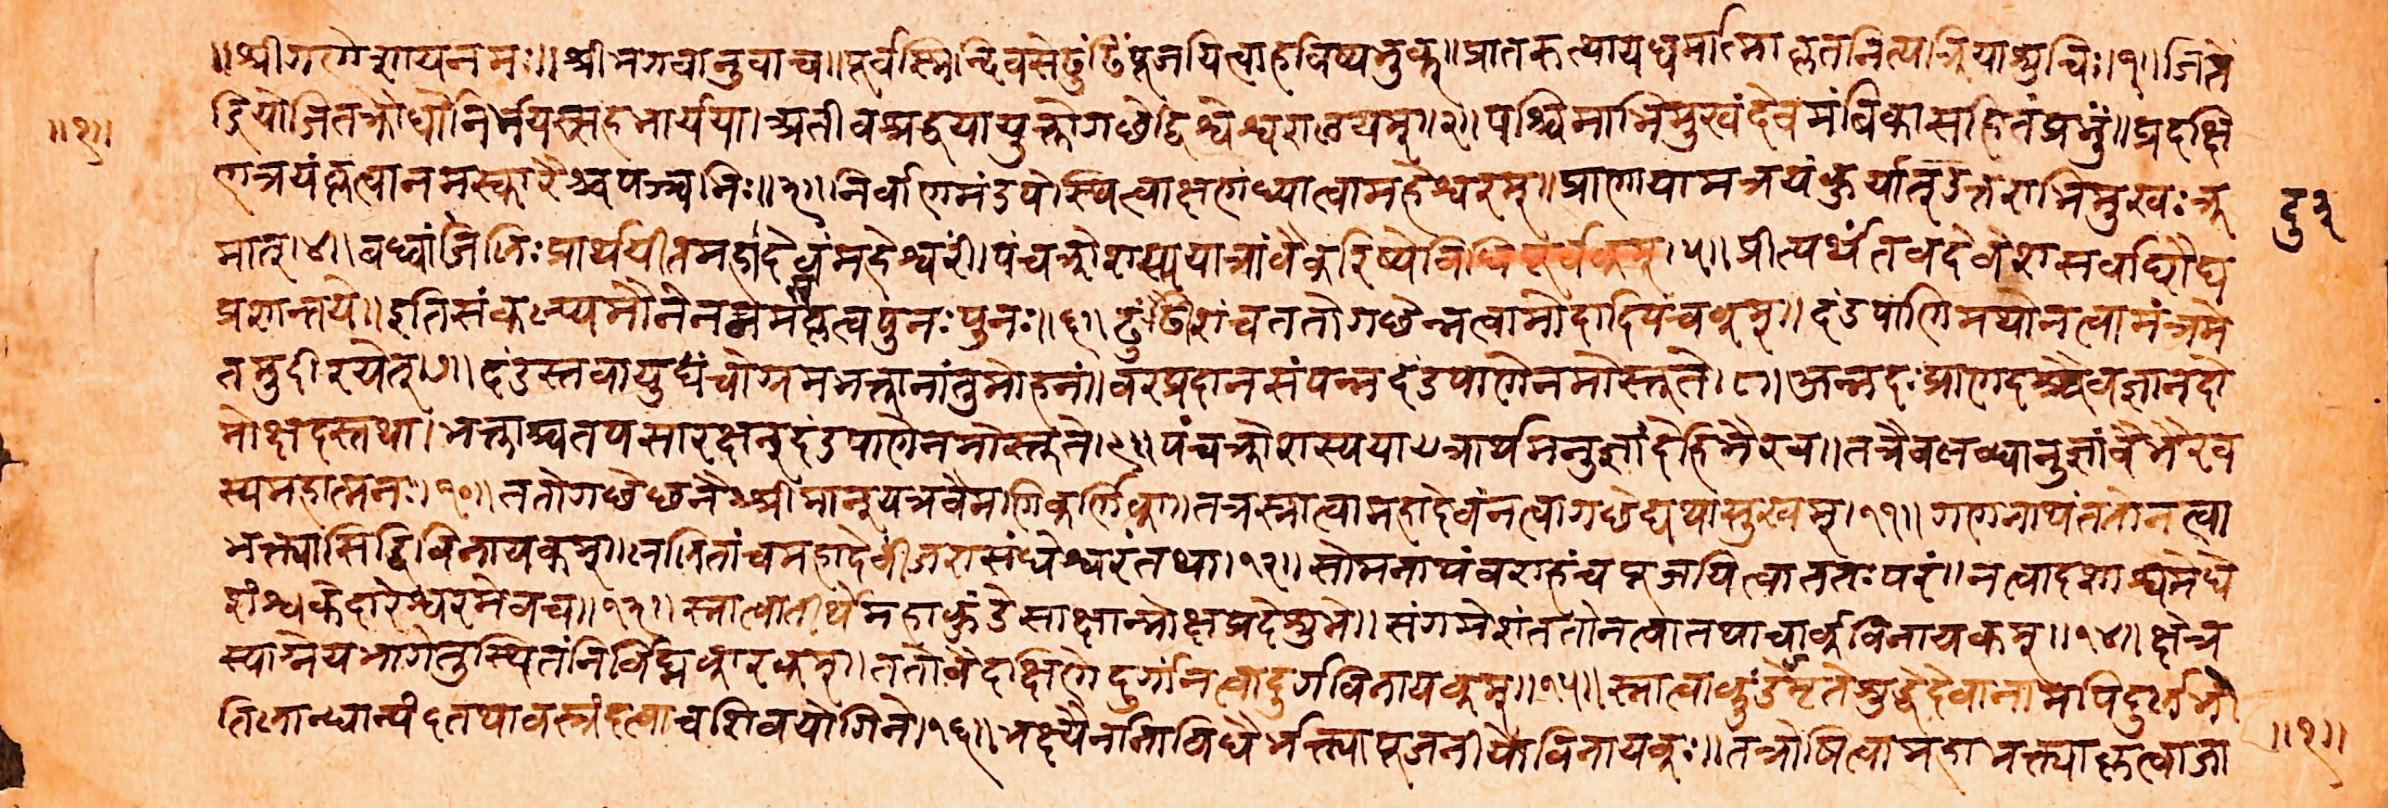 Agni Purana - Wikipedia